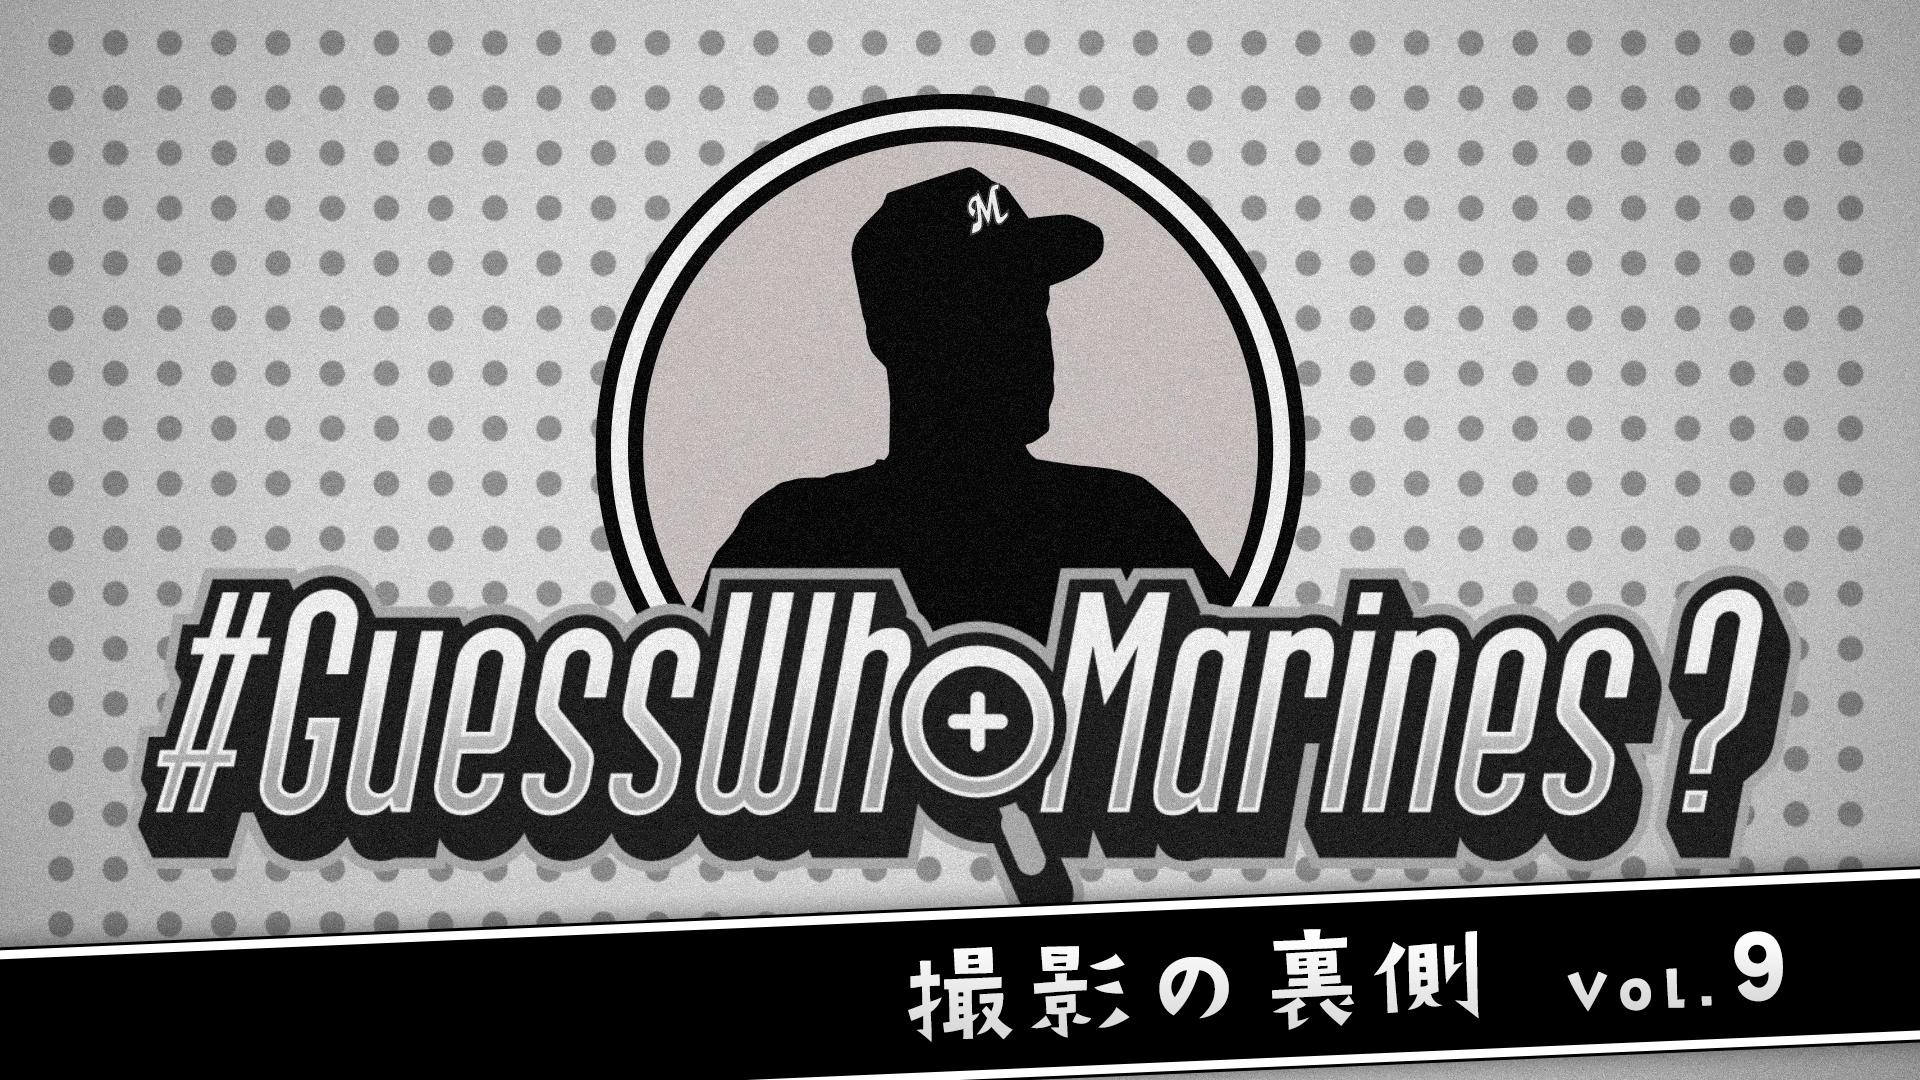 『Guess Who Marines?』撮影の裏側Vol9.【MARINESPLUS】